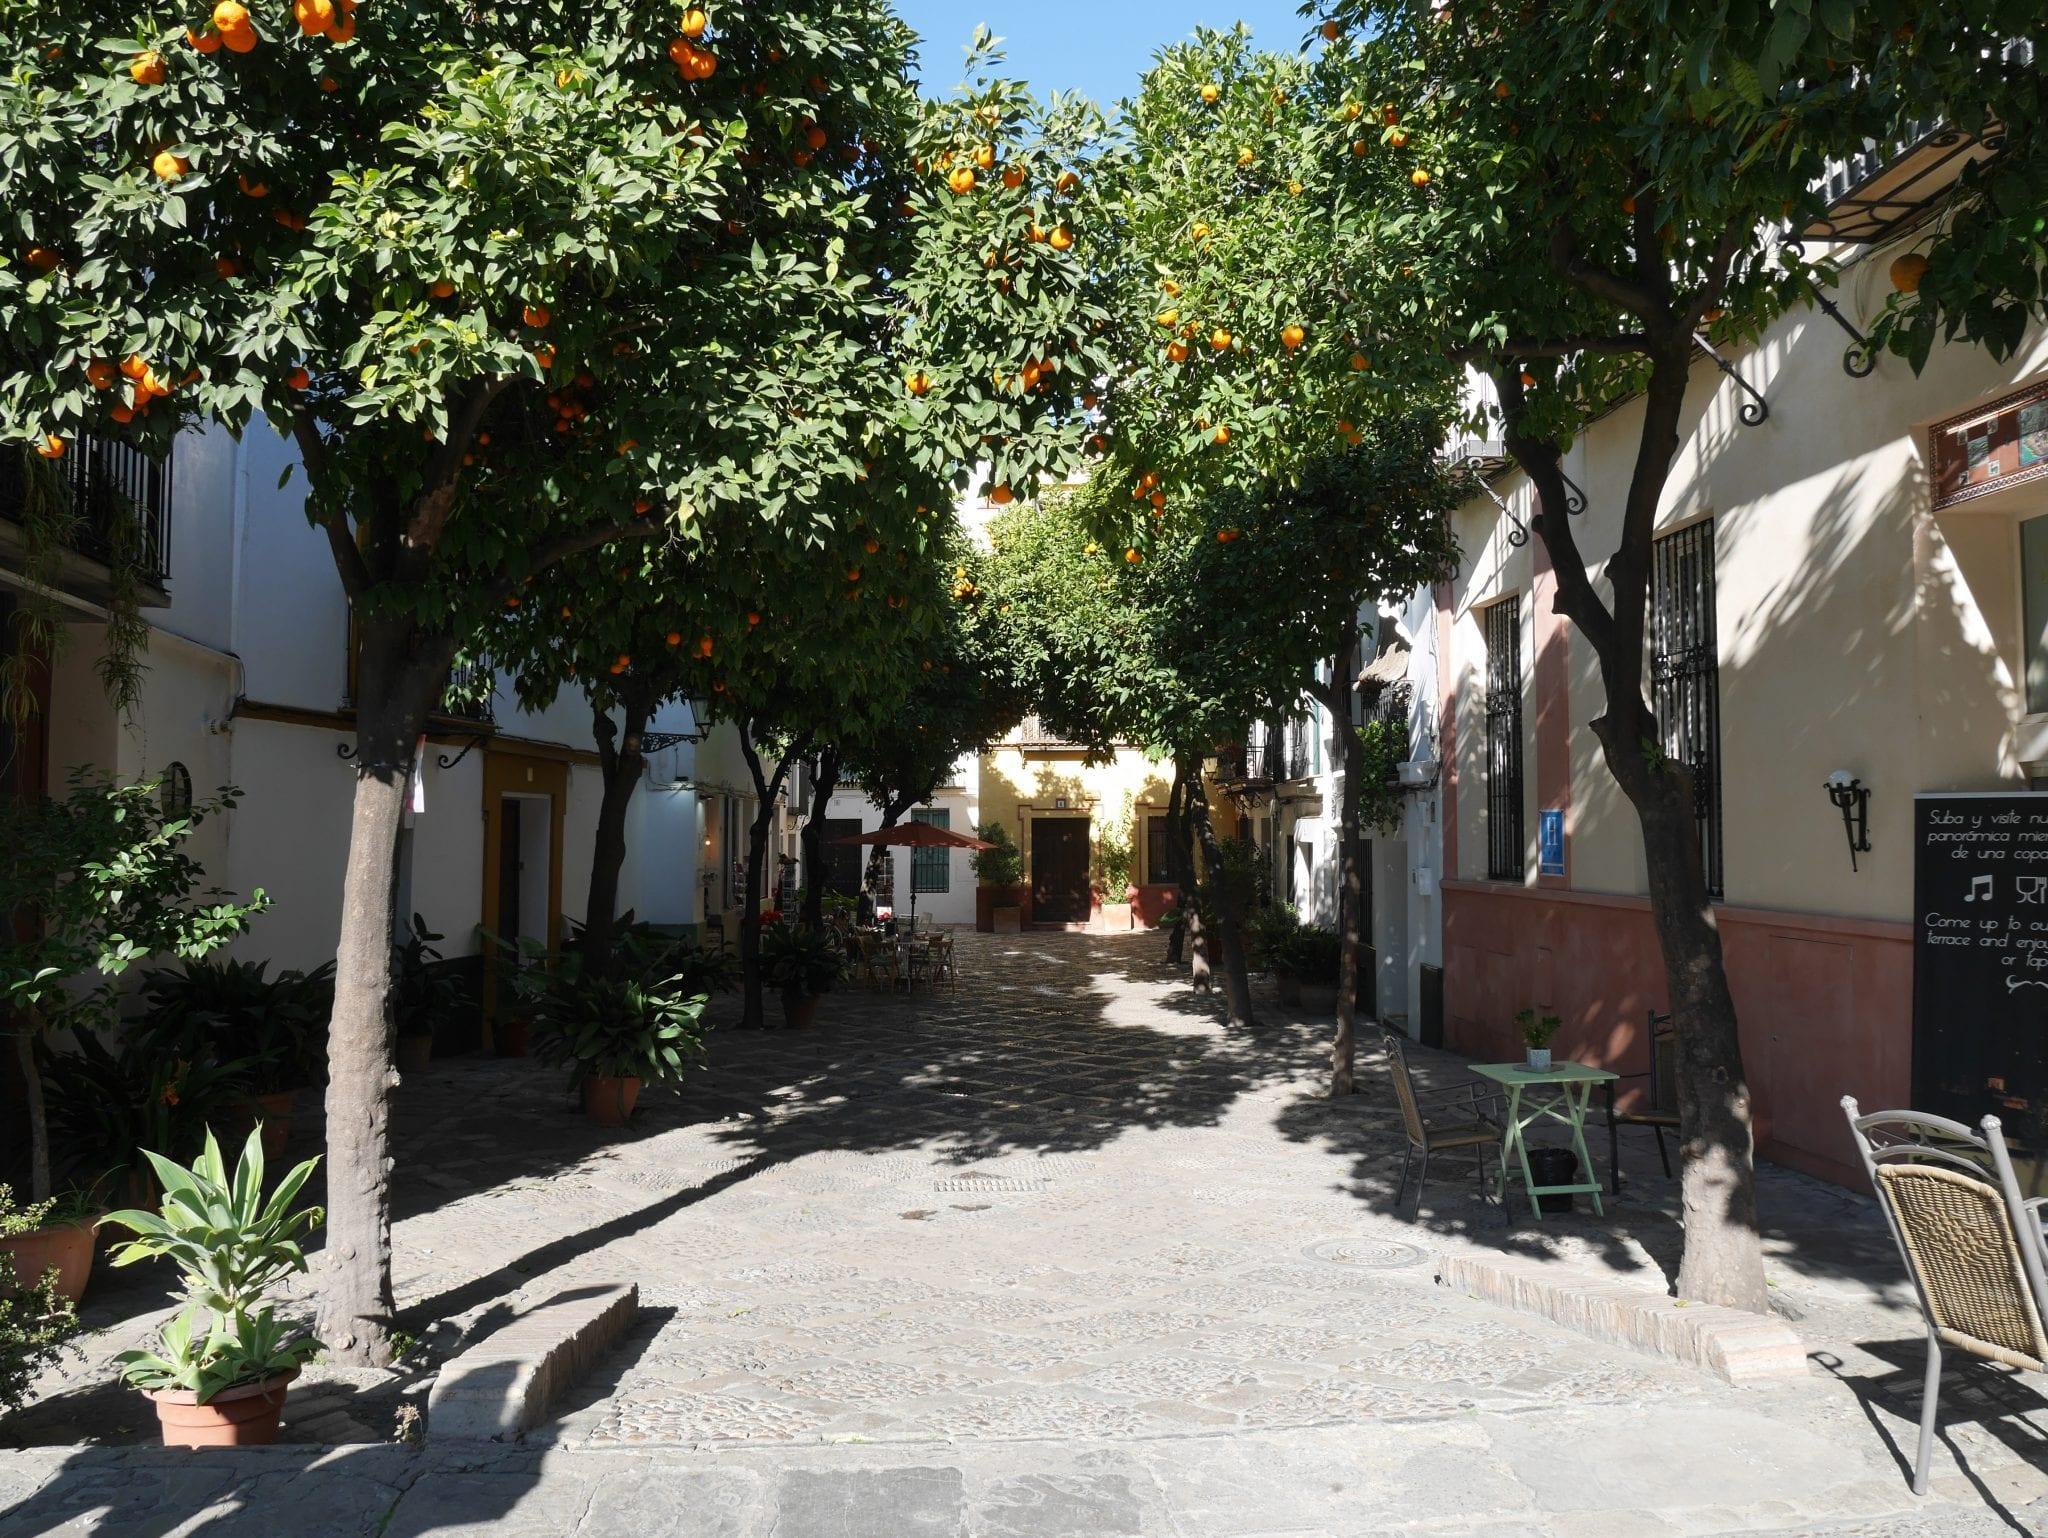 Placa-de-alleanza-Barrio-de-Santa-Cruz-Siviglia-Le-Plume